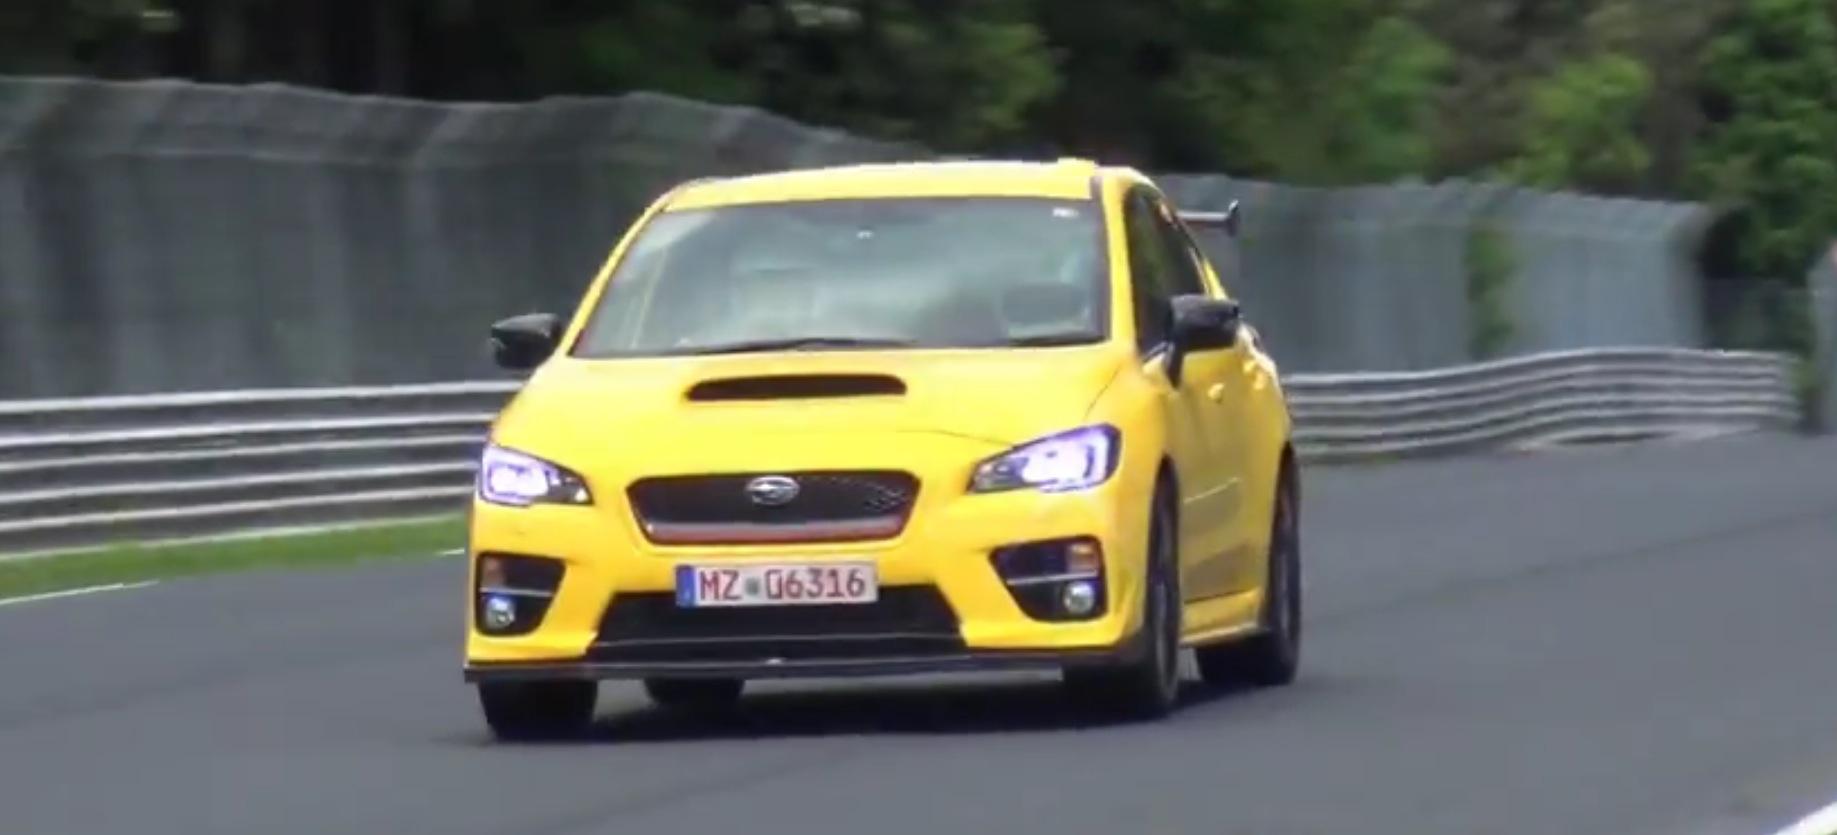 2014 - [Subaru] Impreza WRX/STi  - Page 5 Subaru-wrx-sti-prototype-seen-testing-at-the-nurburgring-video-96052_1